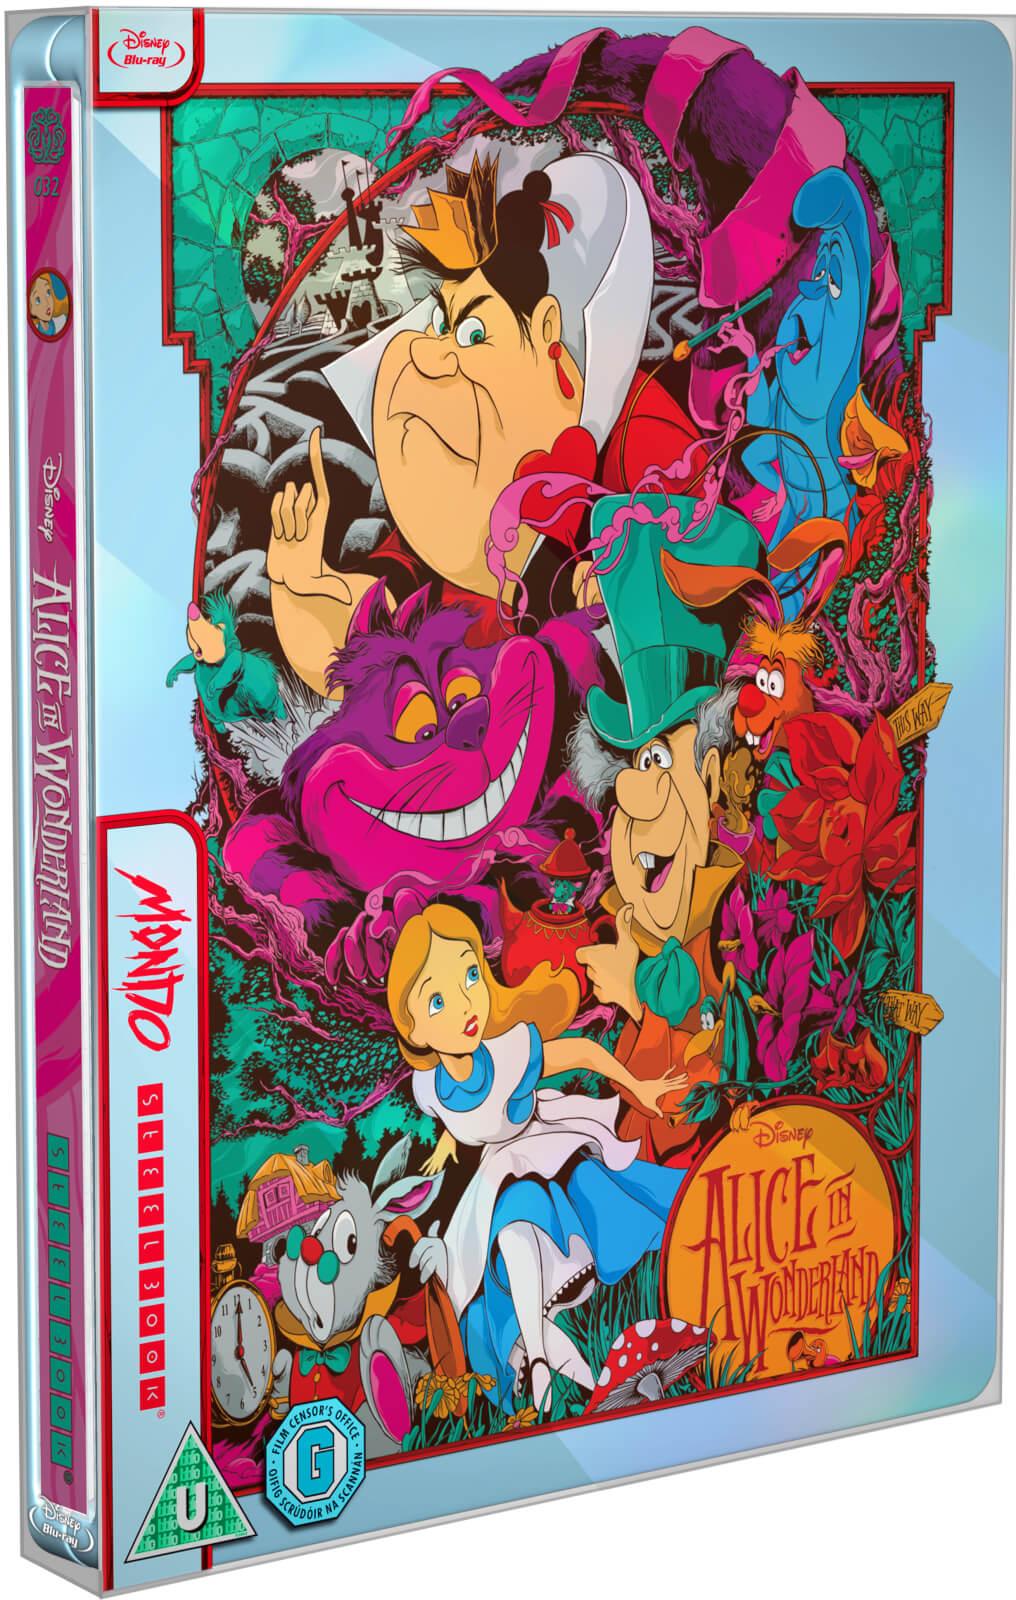 Alice in Wonderland - Mondo #32 Zavvi Exclusive Limited Edition Steelbook